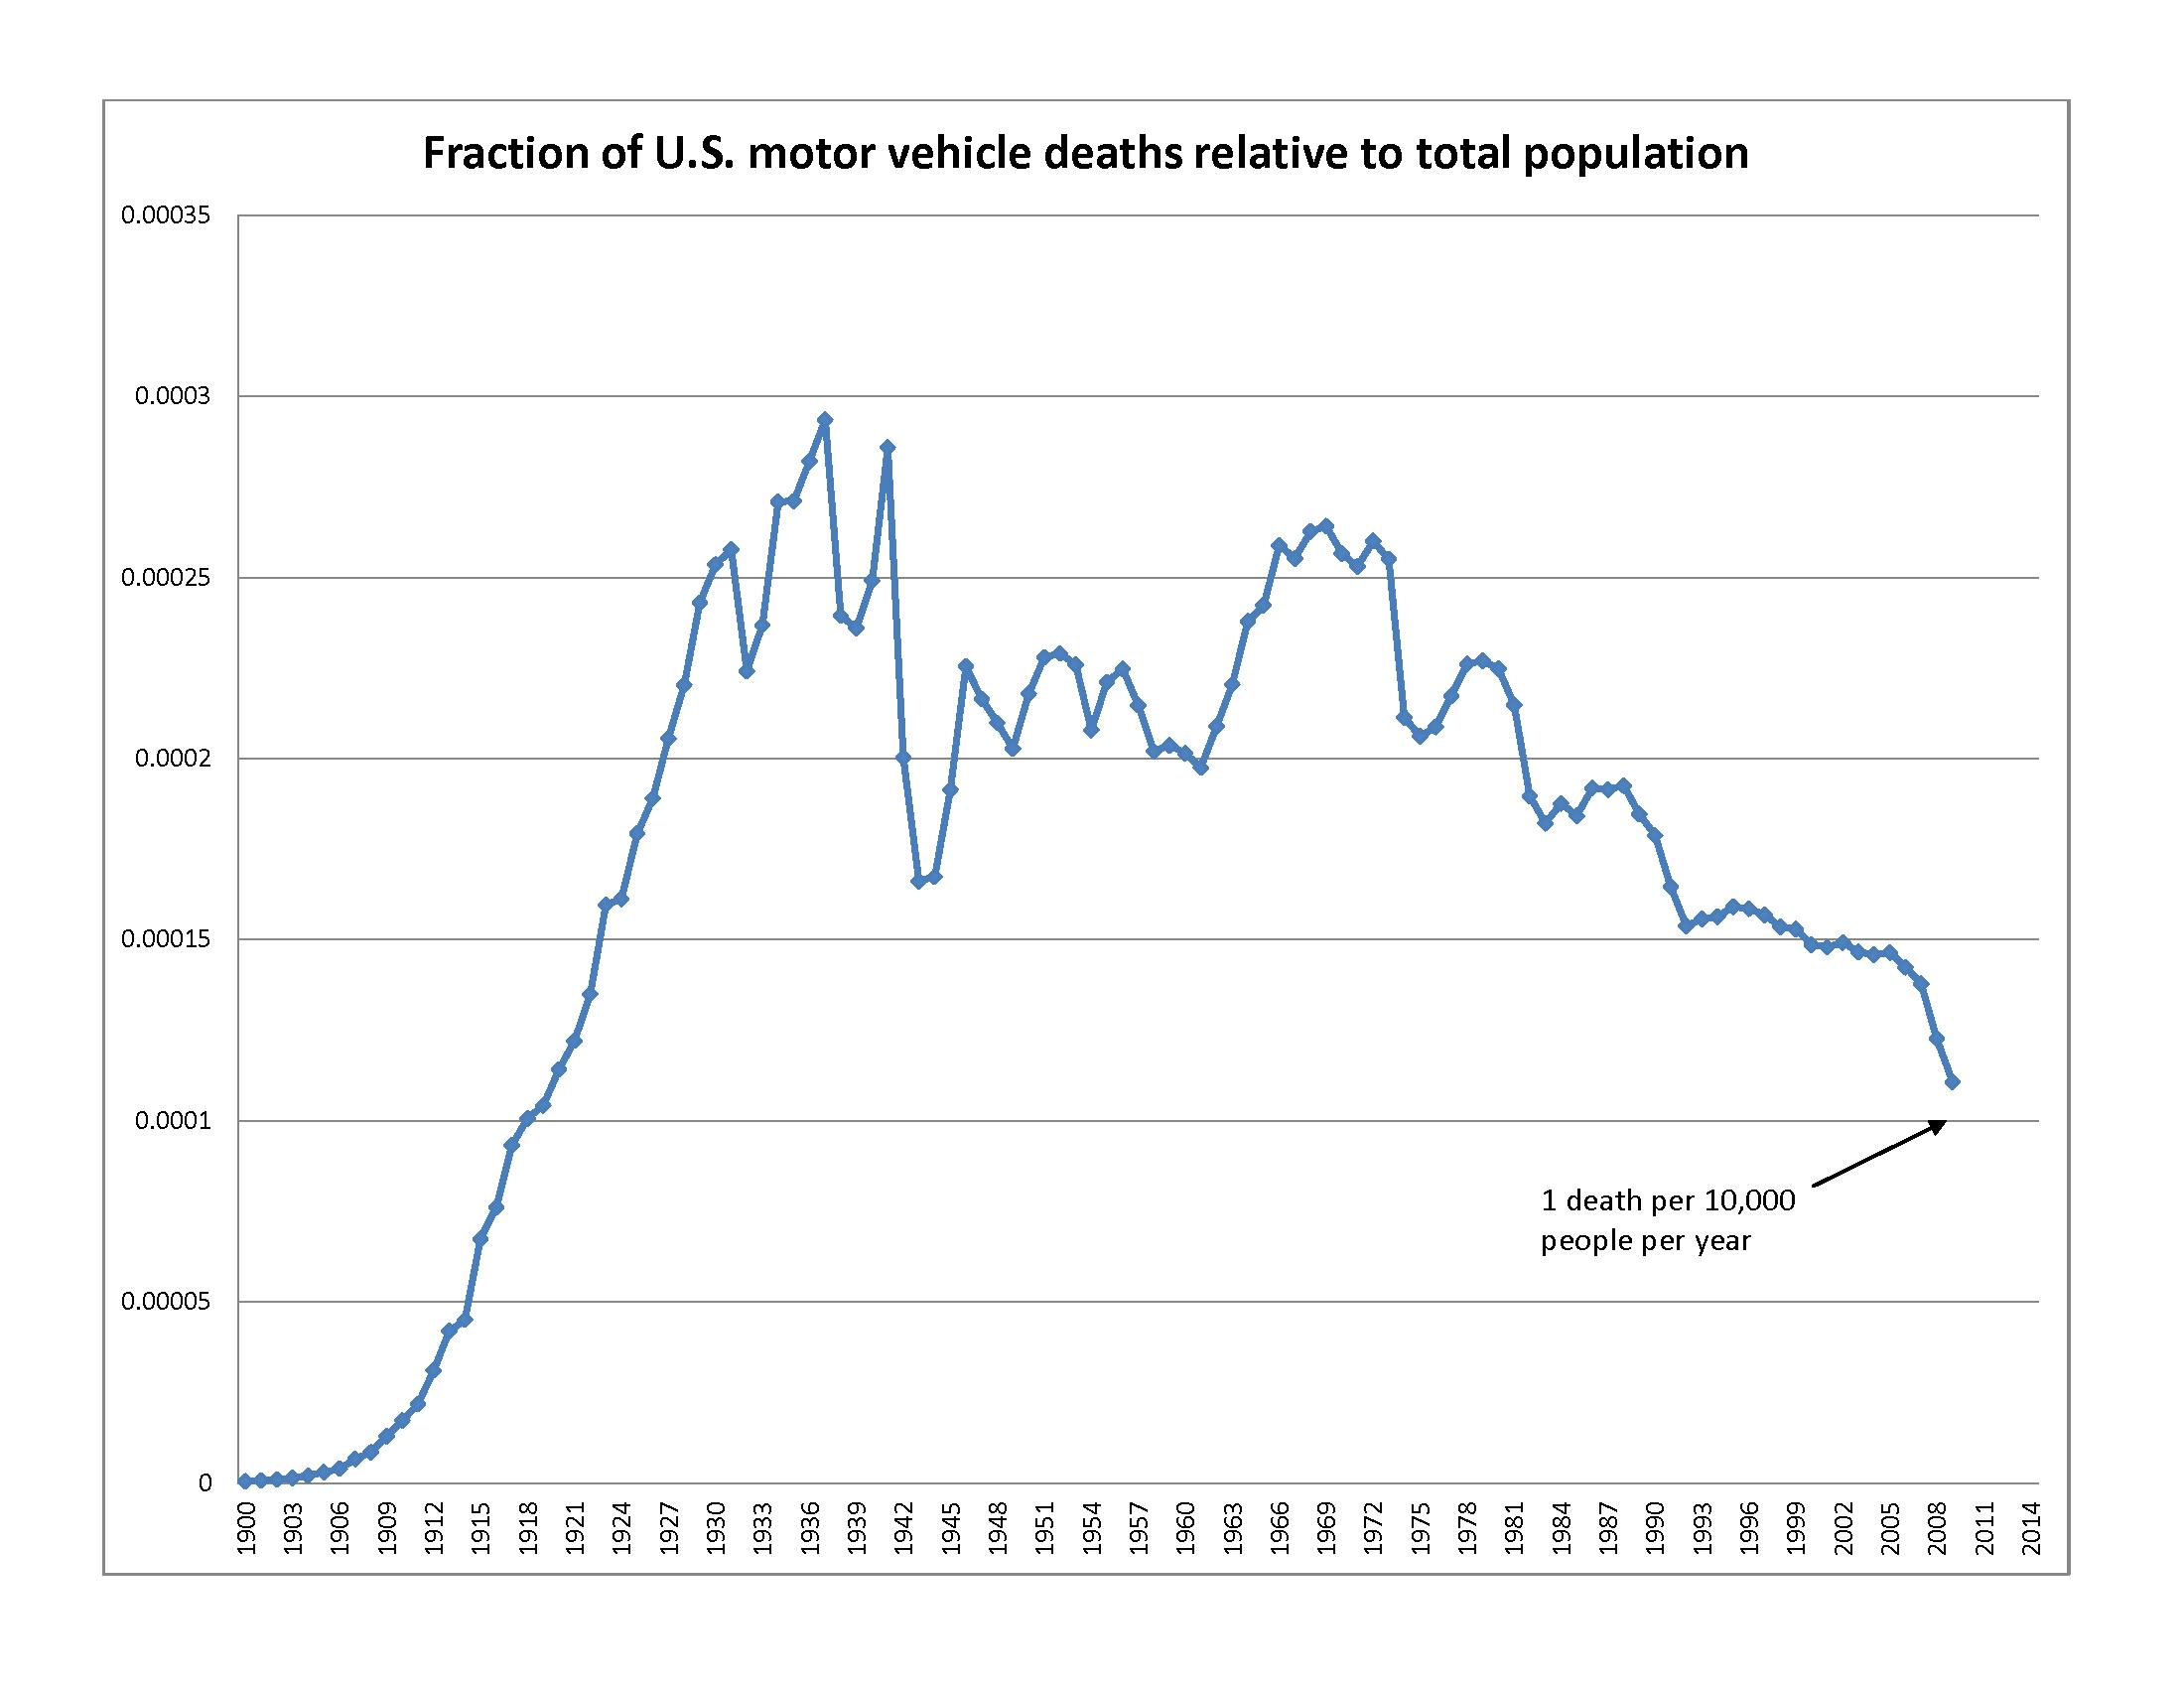 U.S._traffic_deaths_as_fraction_of_total_population_1900-2010.png